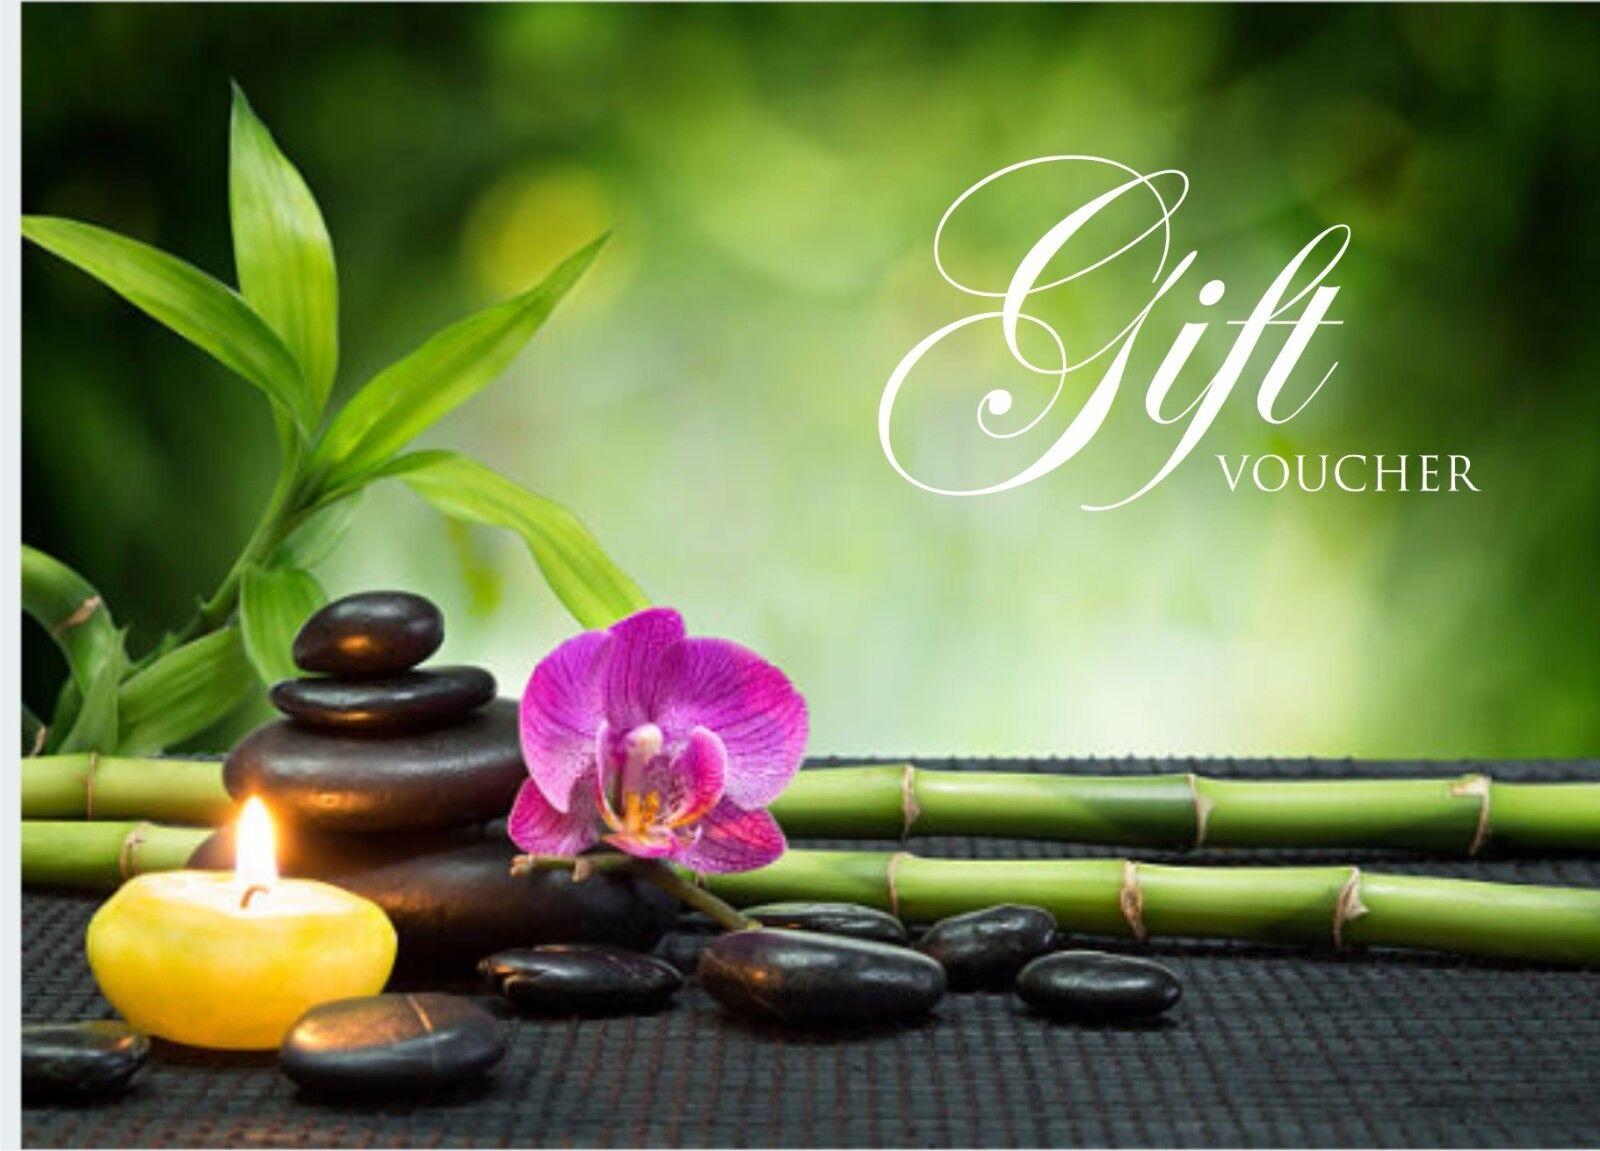 Beauty Salon Gift Vouch Template Blank Card Nail Massage Free